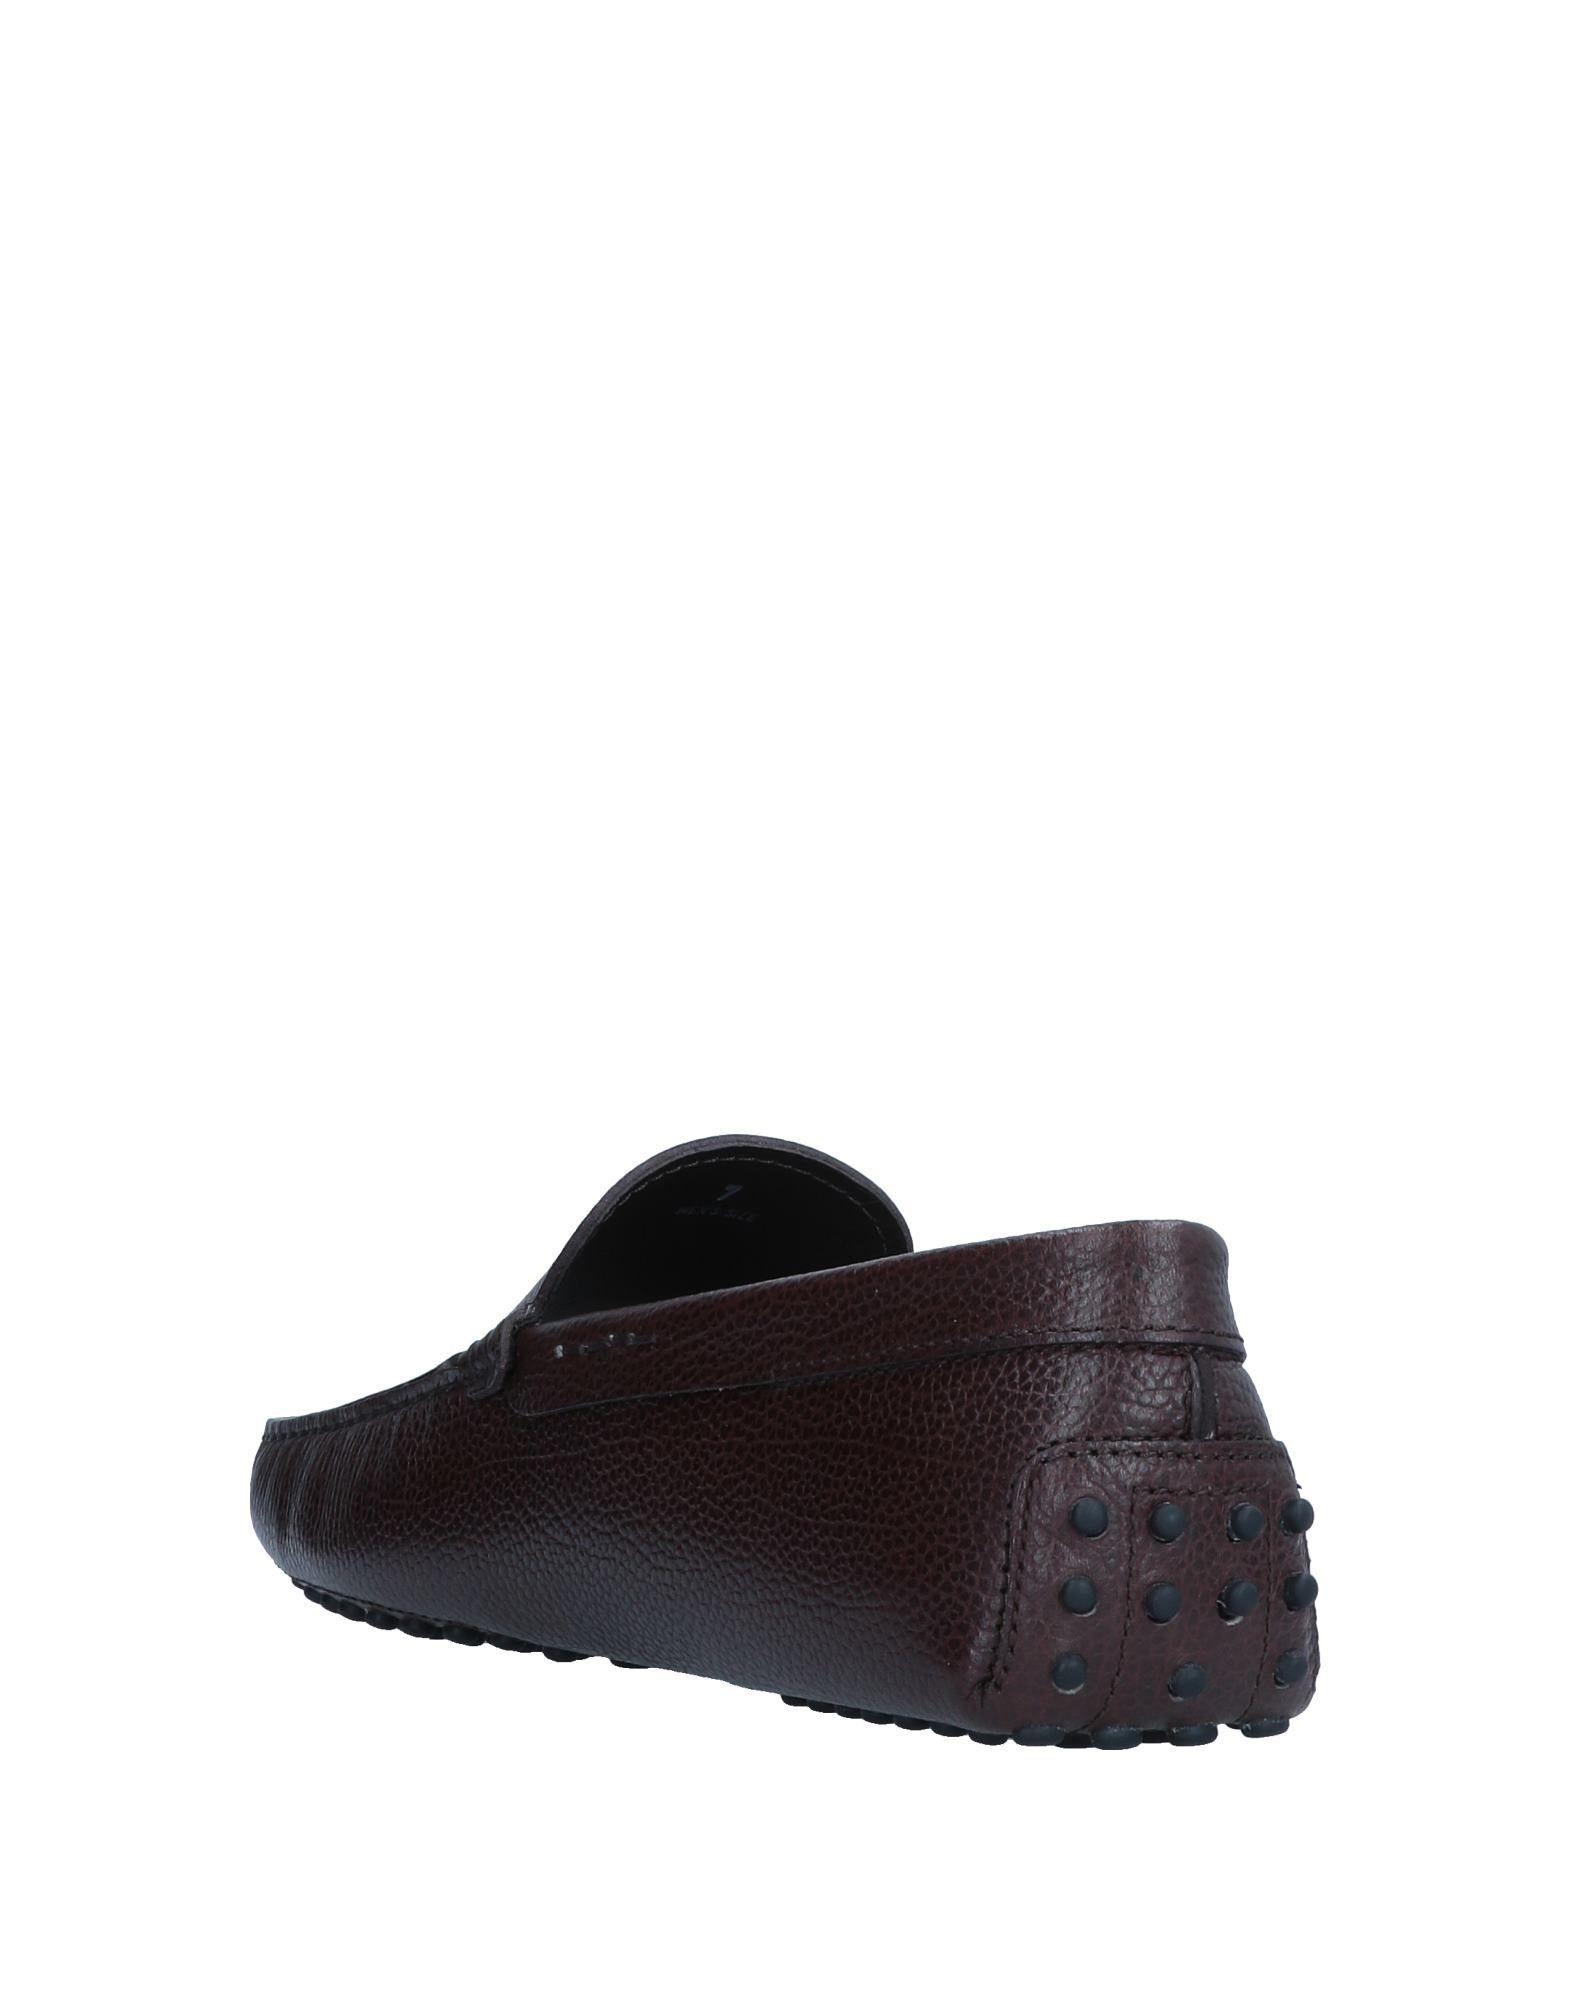 Tod's Gute Mokassins Herren  11548553JW Gute Tod's Qualität beliebte Schuhe 5fcca2